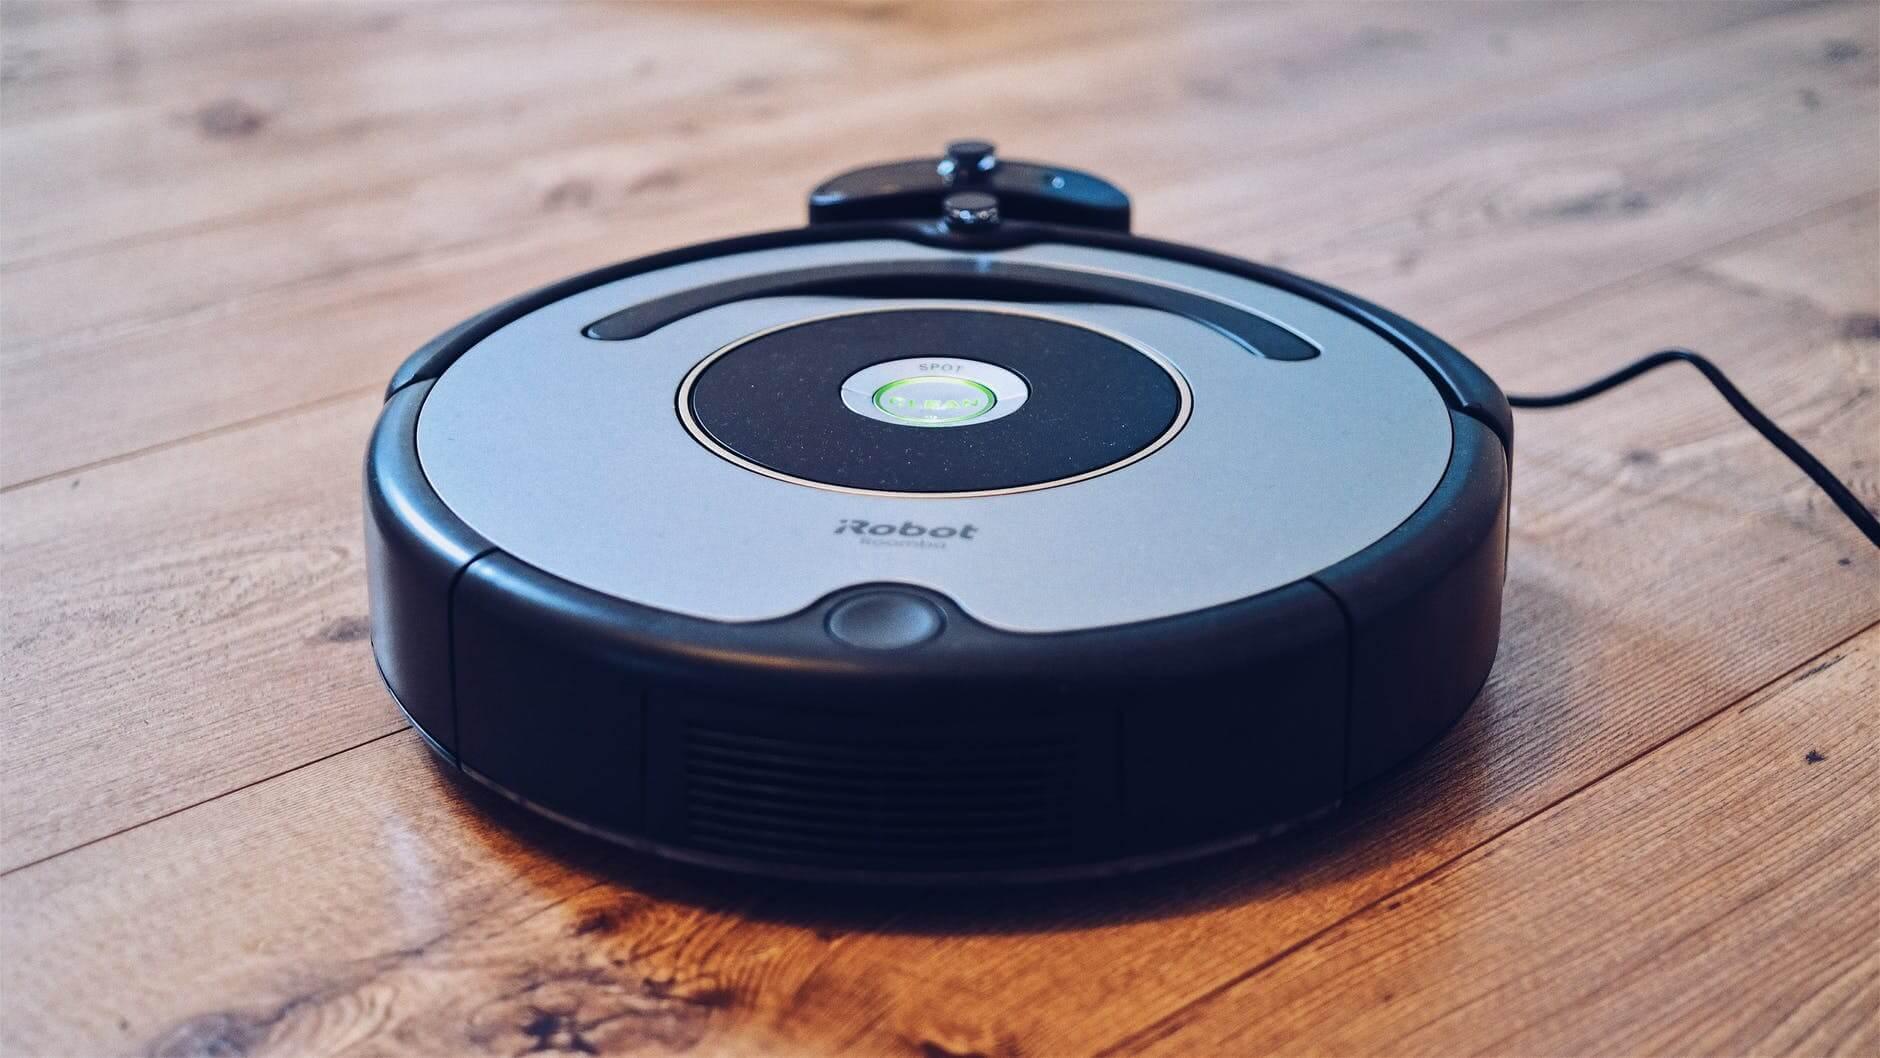 lightweight robot vacuum cleaner